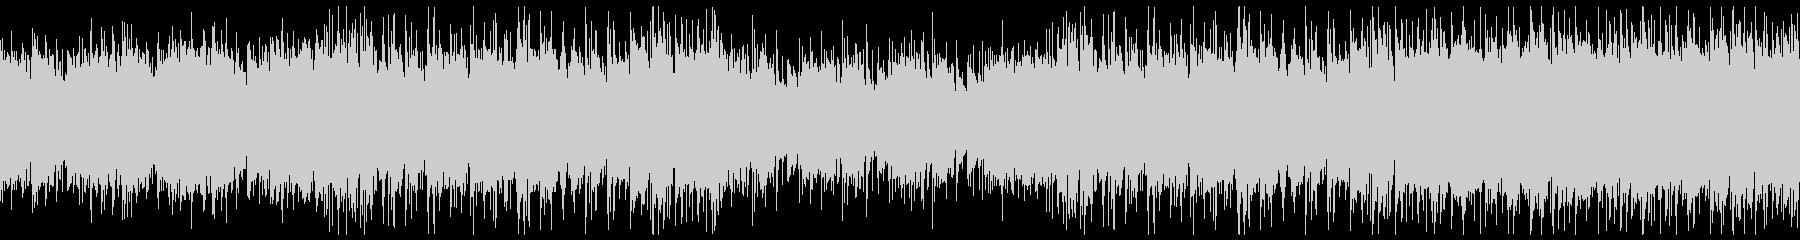 CM・ポジティブなシニア・ポップ・ループの未再生の波形